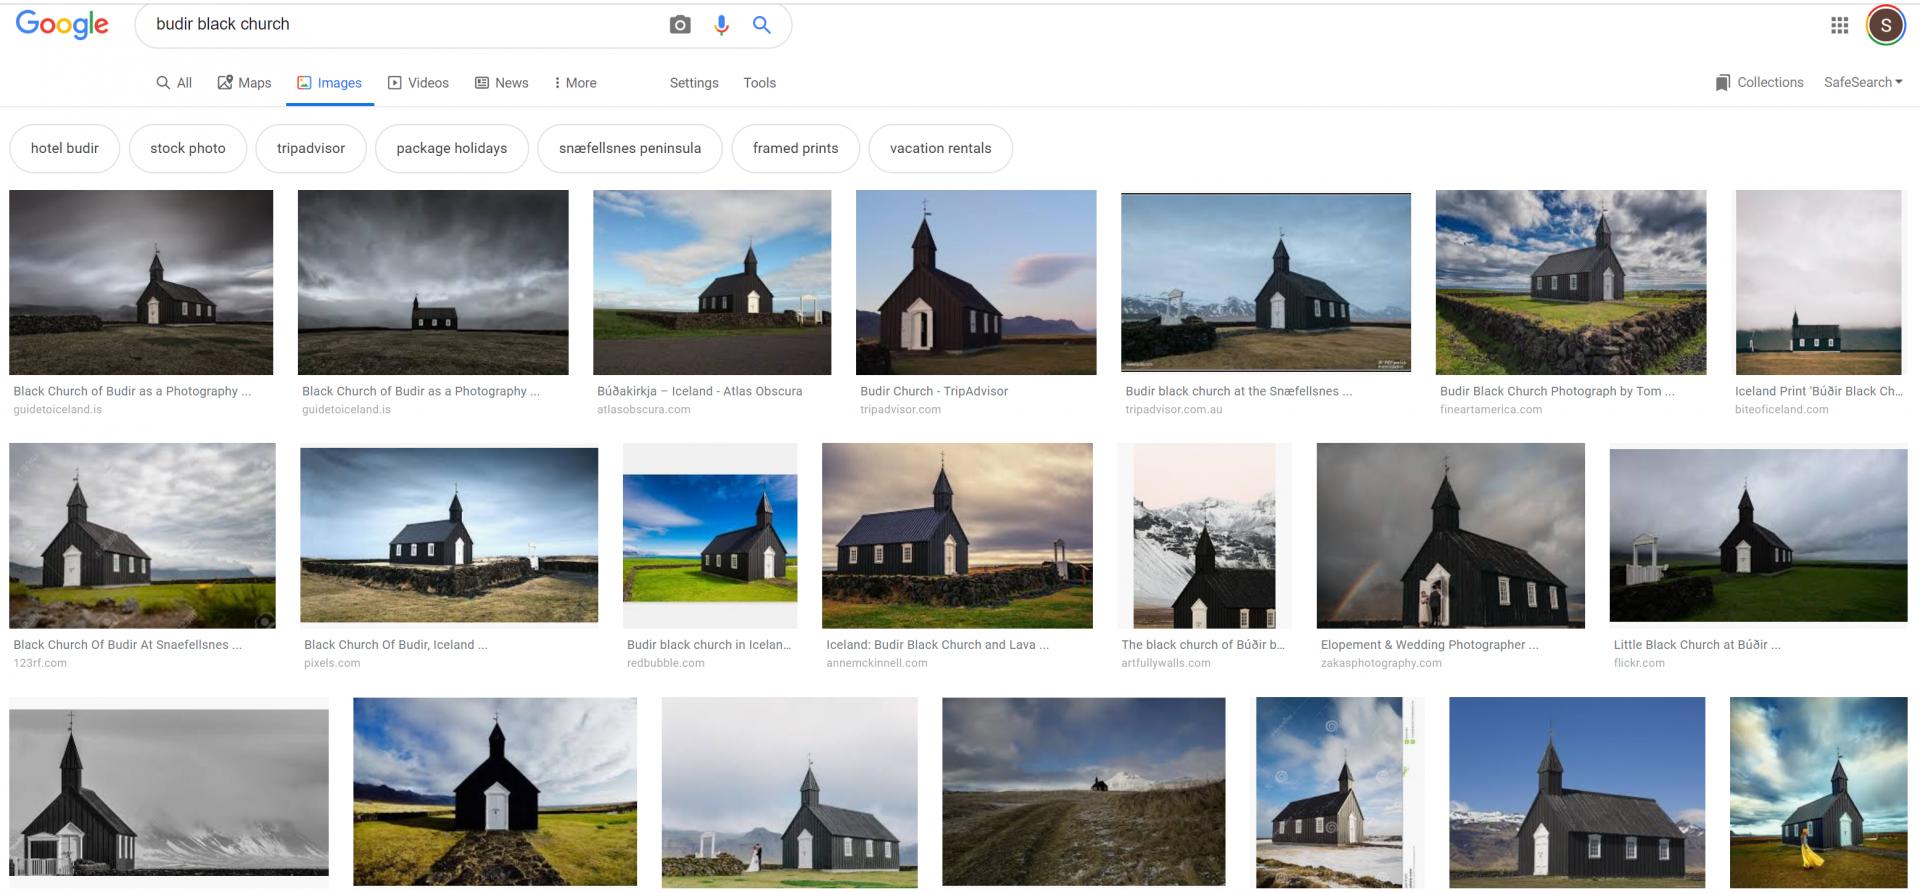 Google images of Budir